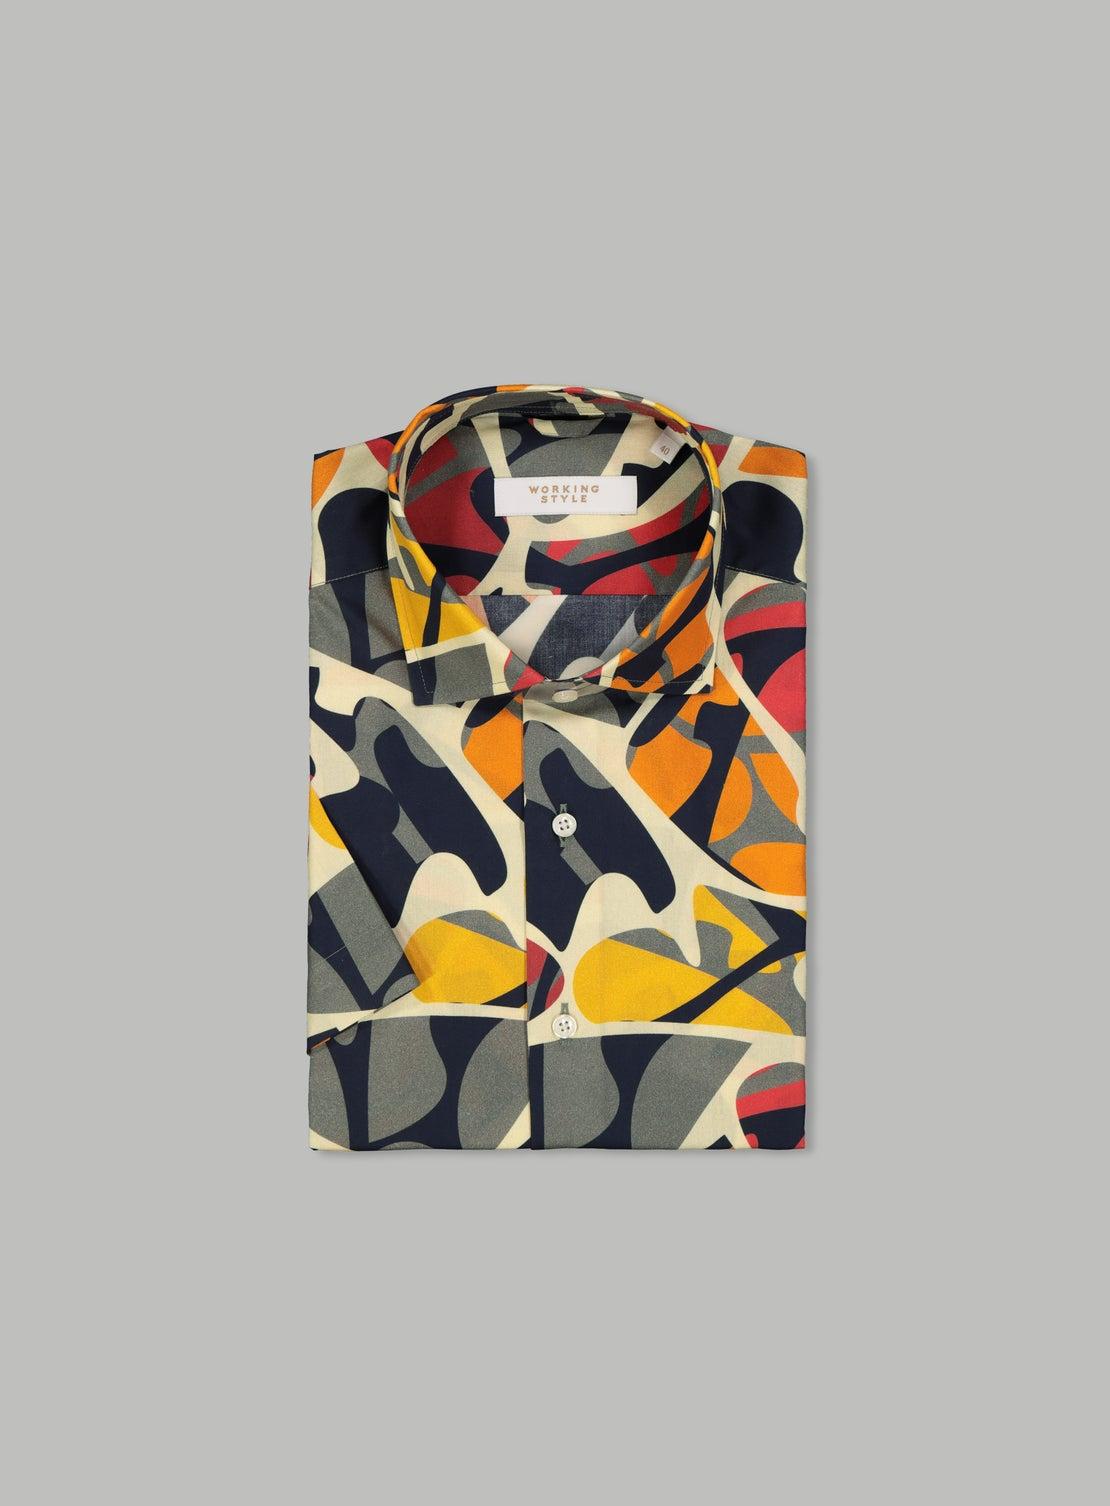 Alexander Multi Short Sleeve Shirt